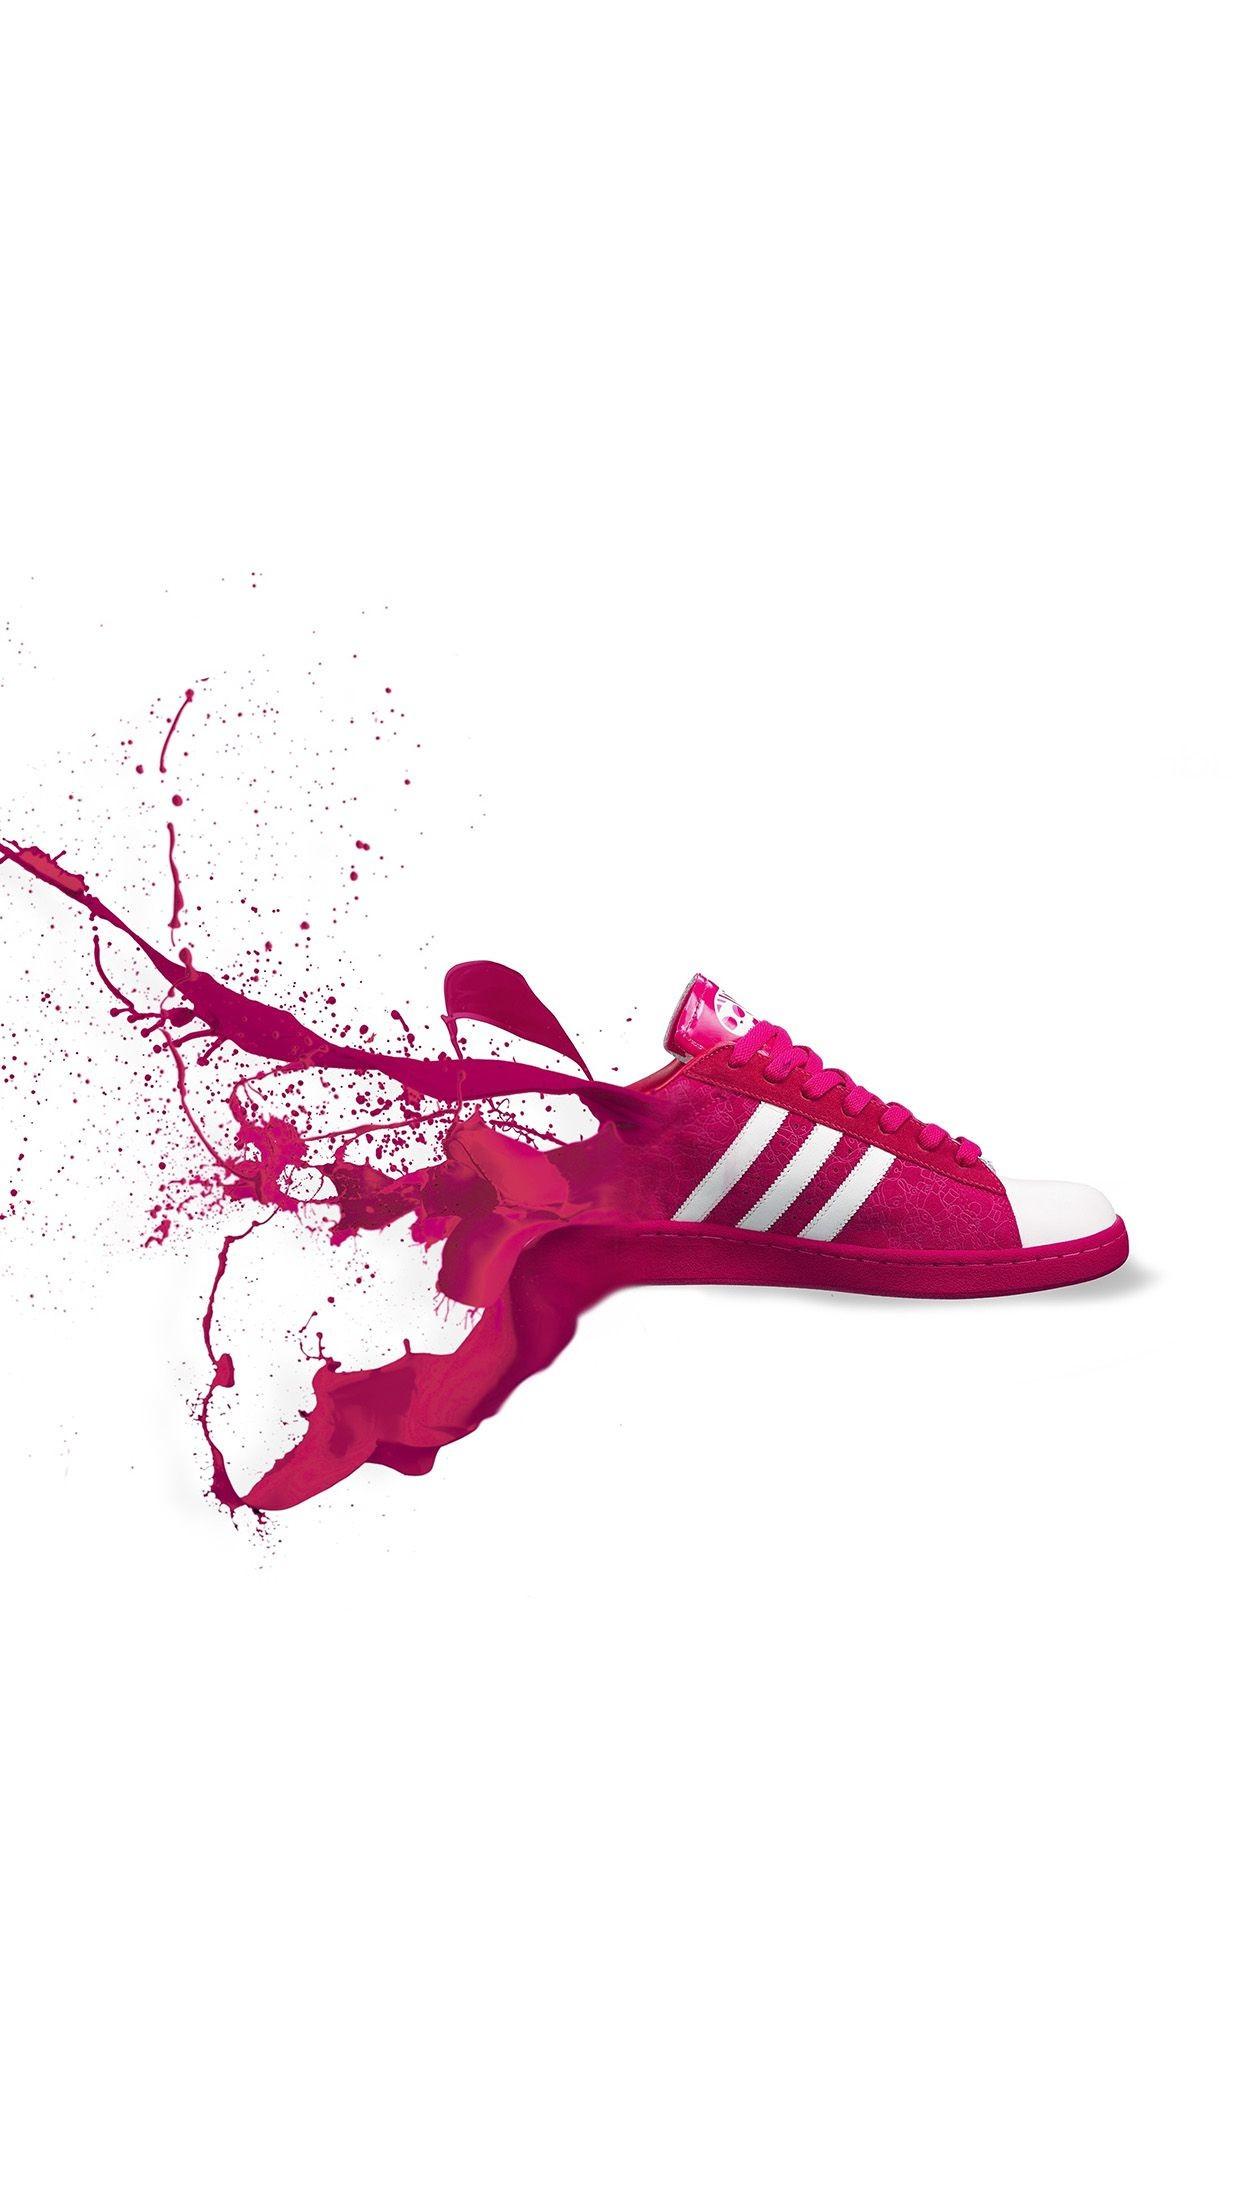 adidas red shoes sneakers logo art splash iphone 7 wallpaper